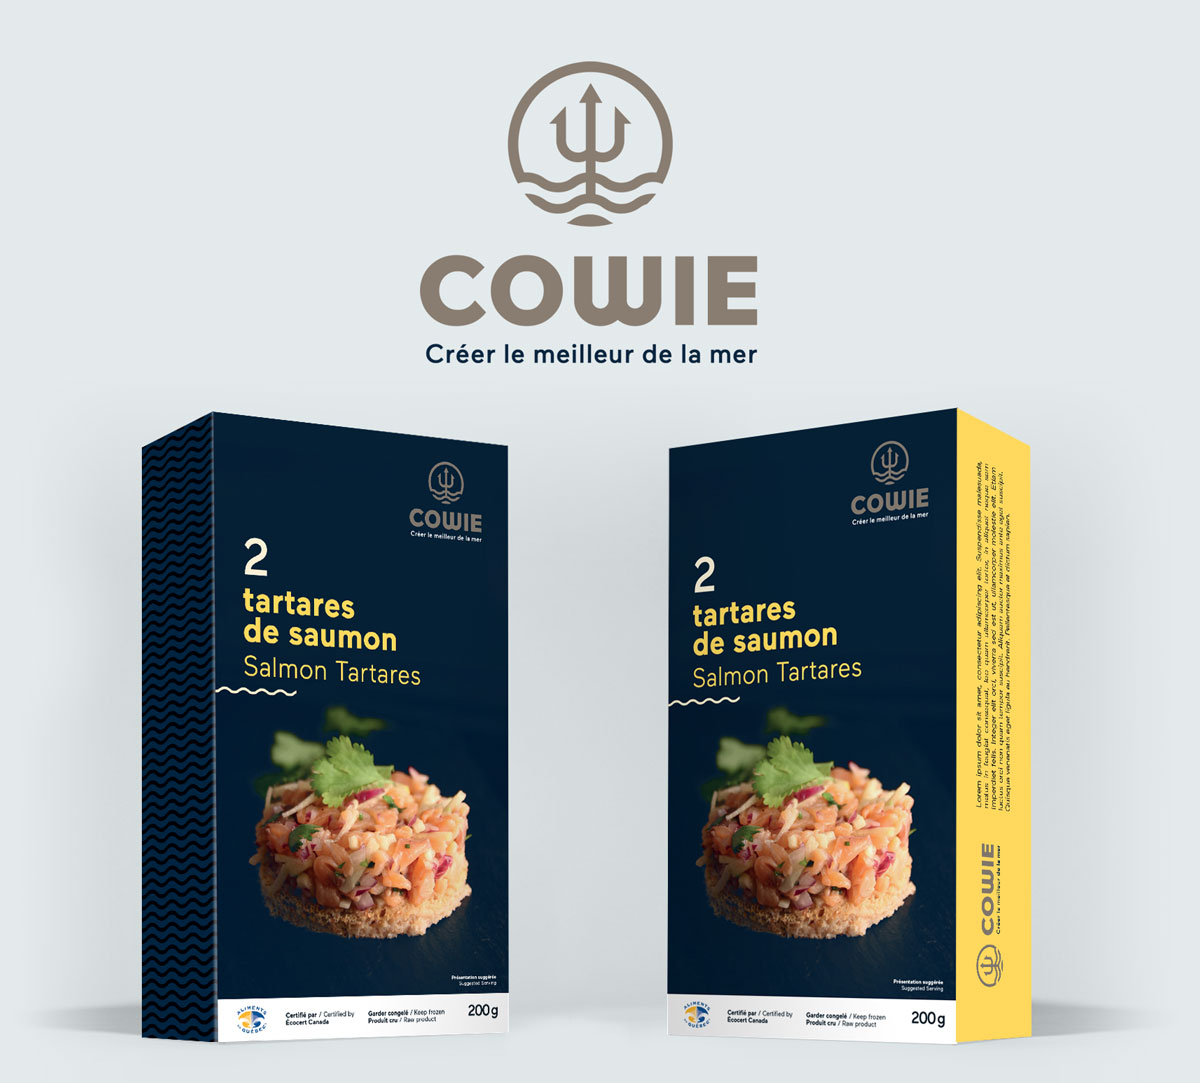 emballage tartare cowie